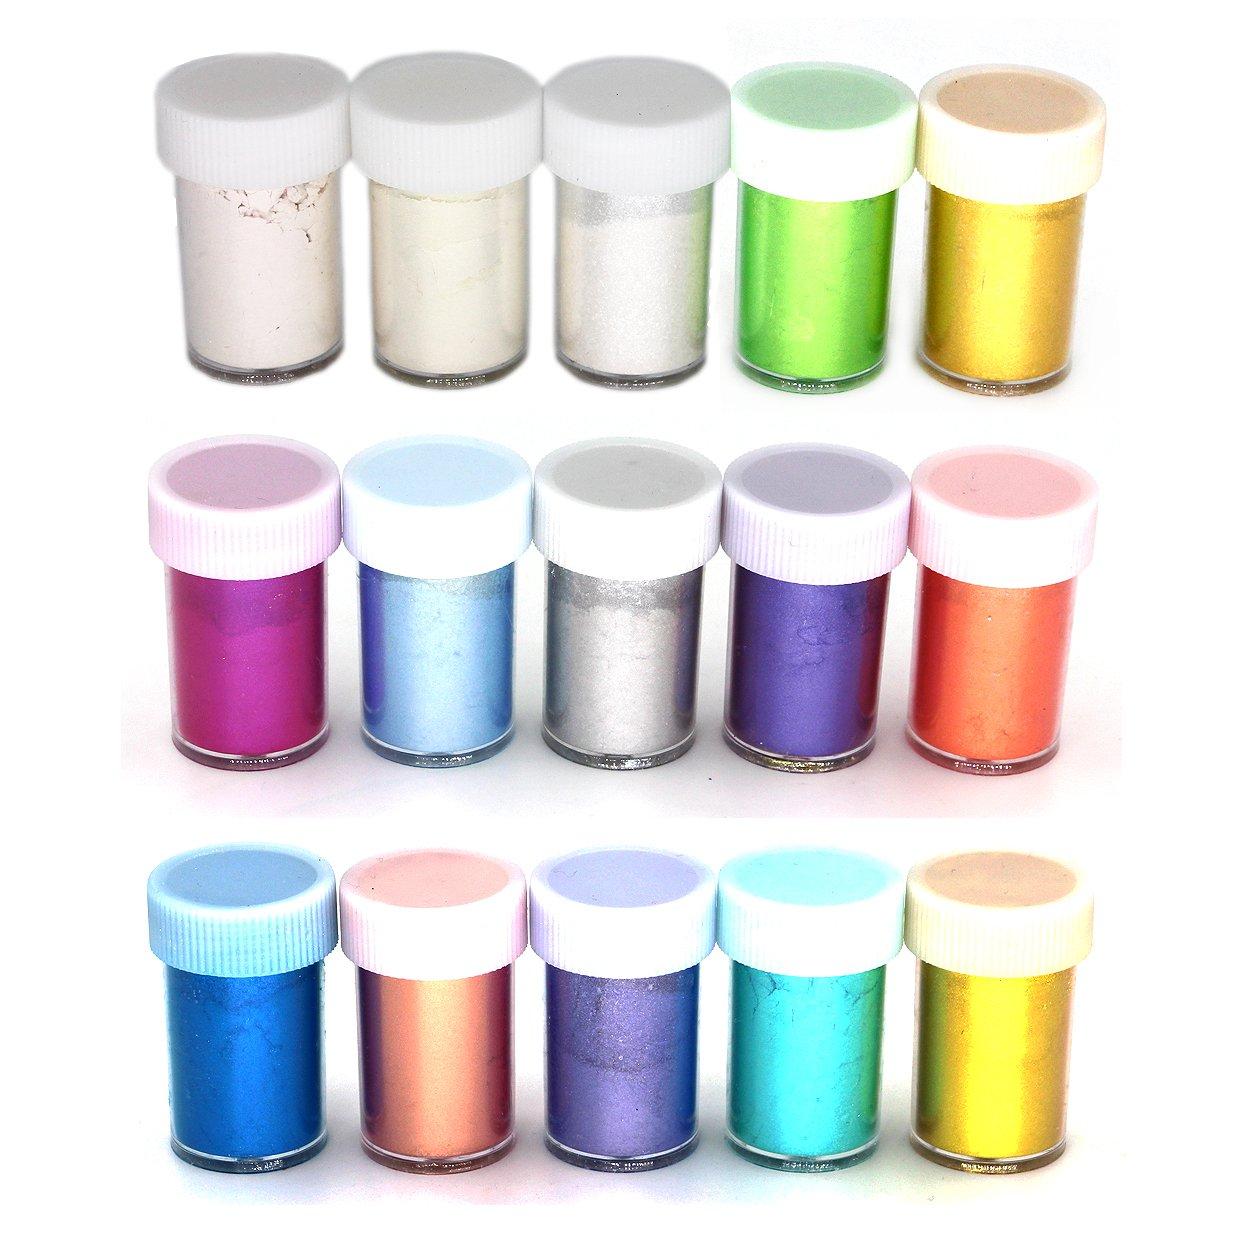 15 Colors Slime Dye Powder Mica Powder Pearl Pigments Soap Dye - Soap Making Colorants Set Colorants for Bath Bomb,Candle Making, Blush, Eye Shadow, Cosmetic, Nail Art, Resin Jewelry Miraclekoo 4336900799